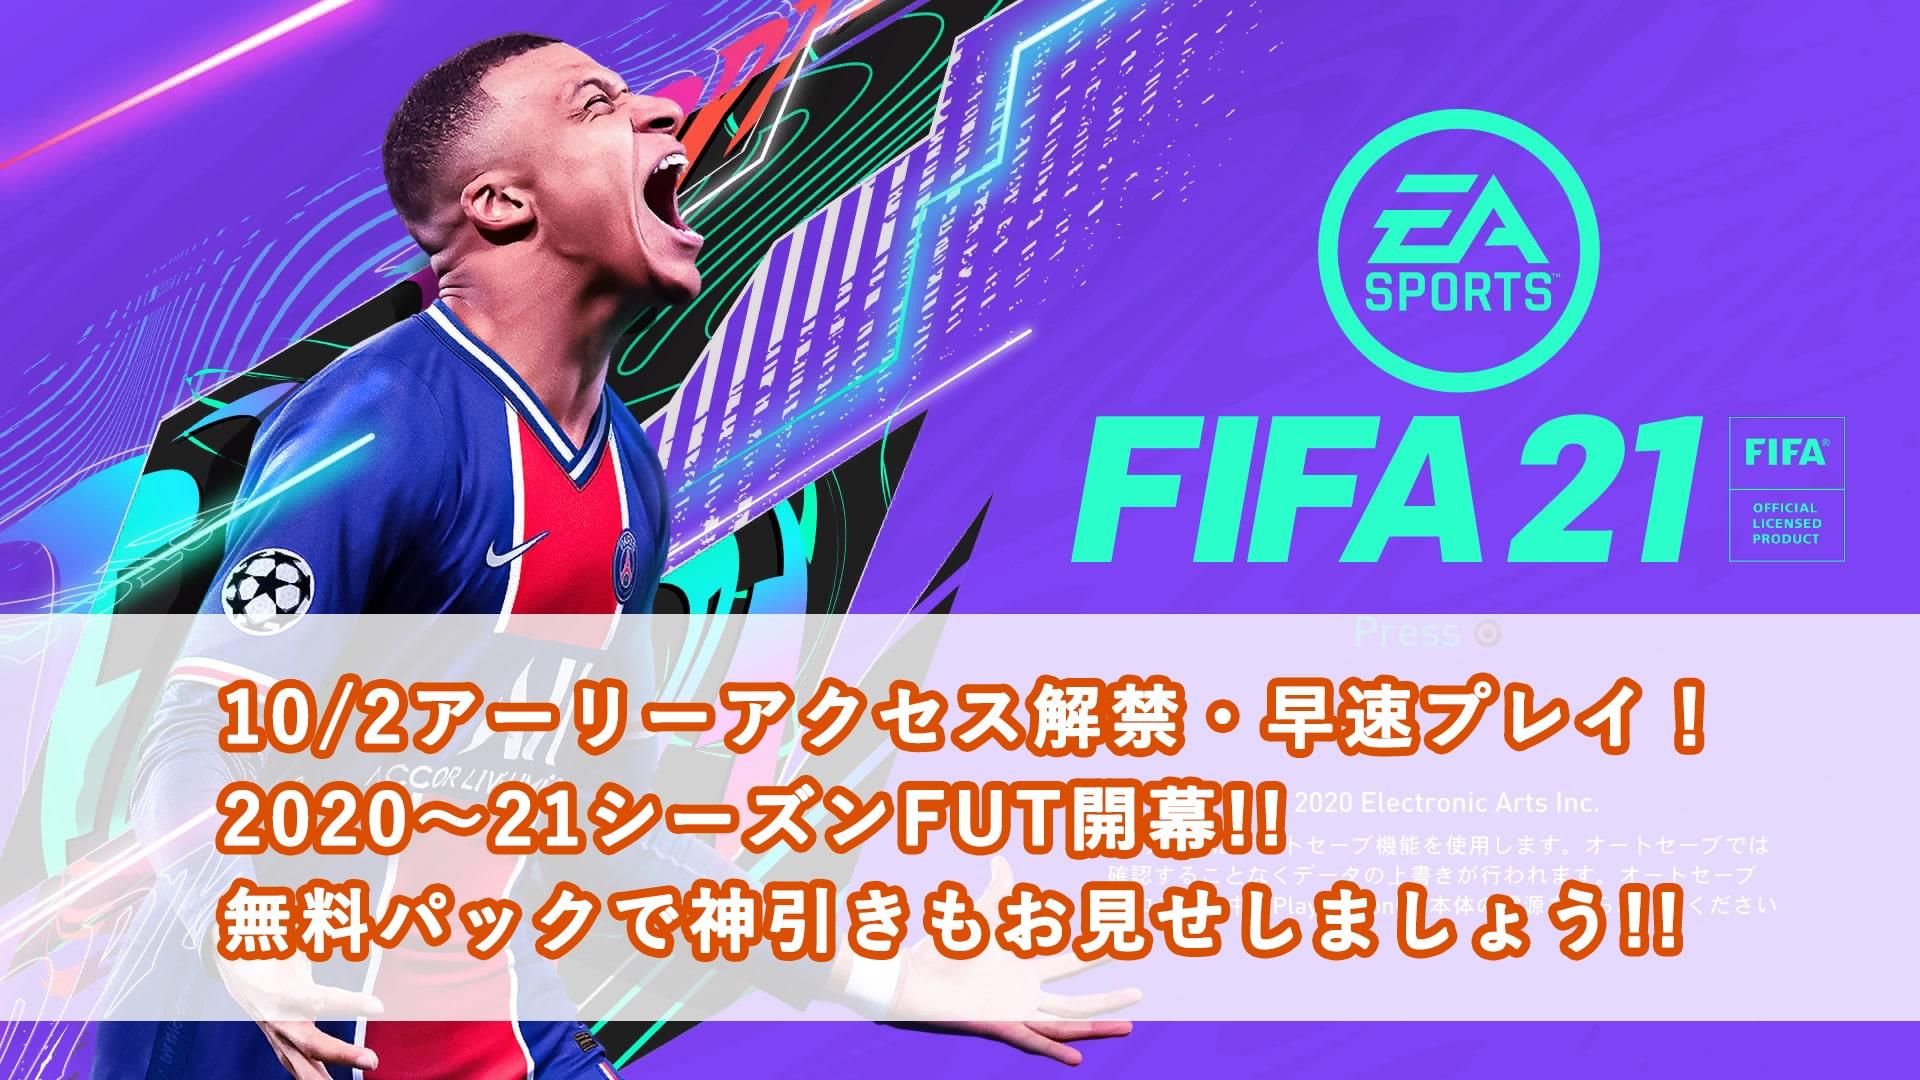 【FIFA21】FUT20-21シーズン遂に開幕!無料パックで神引き続出!